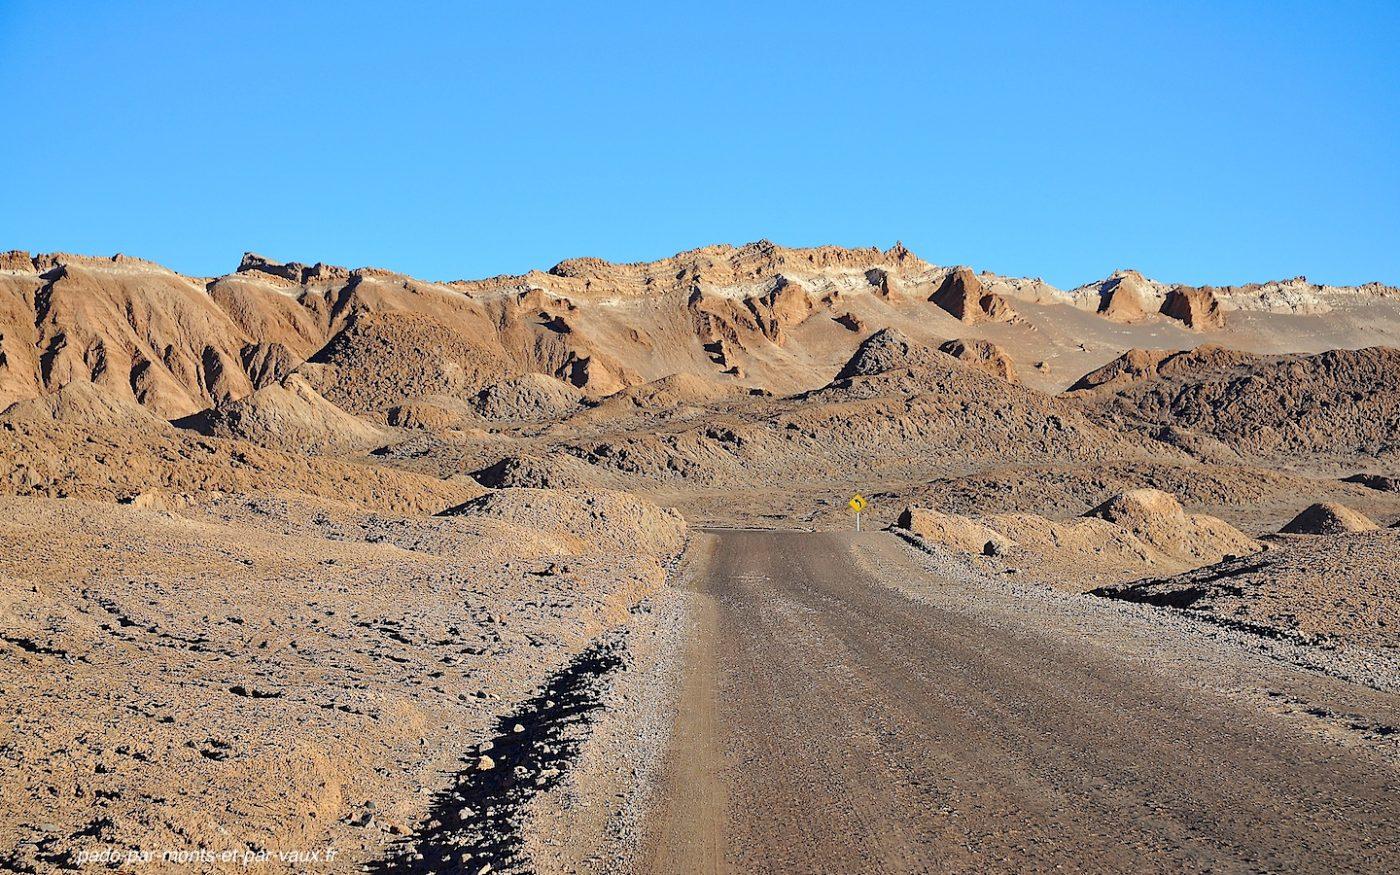 Désert d'Atacama - Vallée de la lune